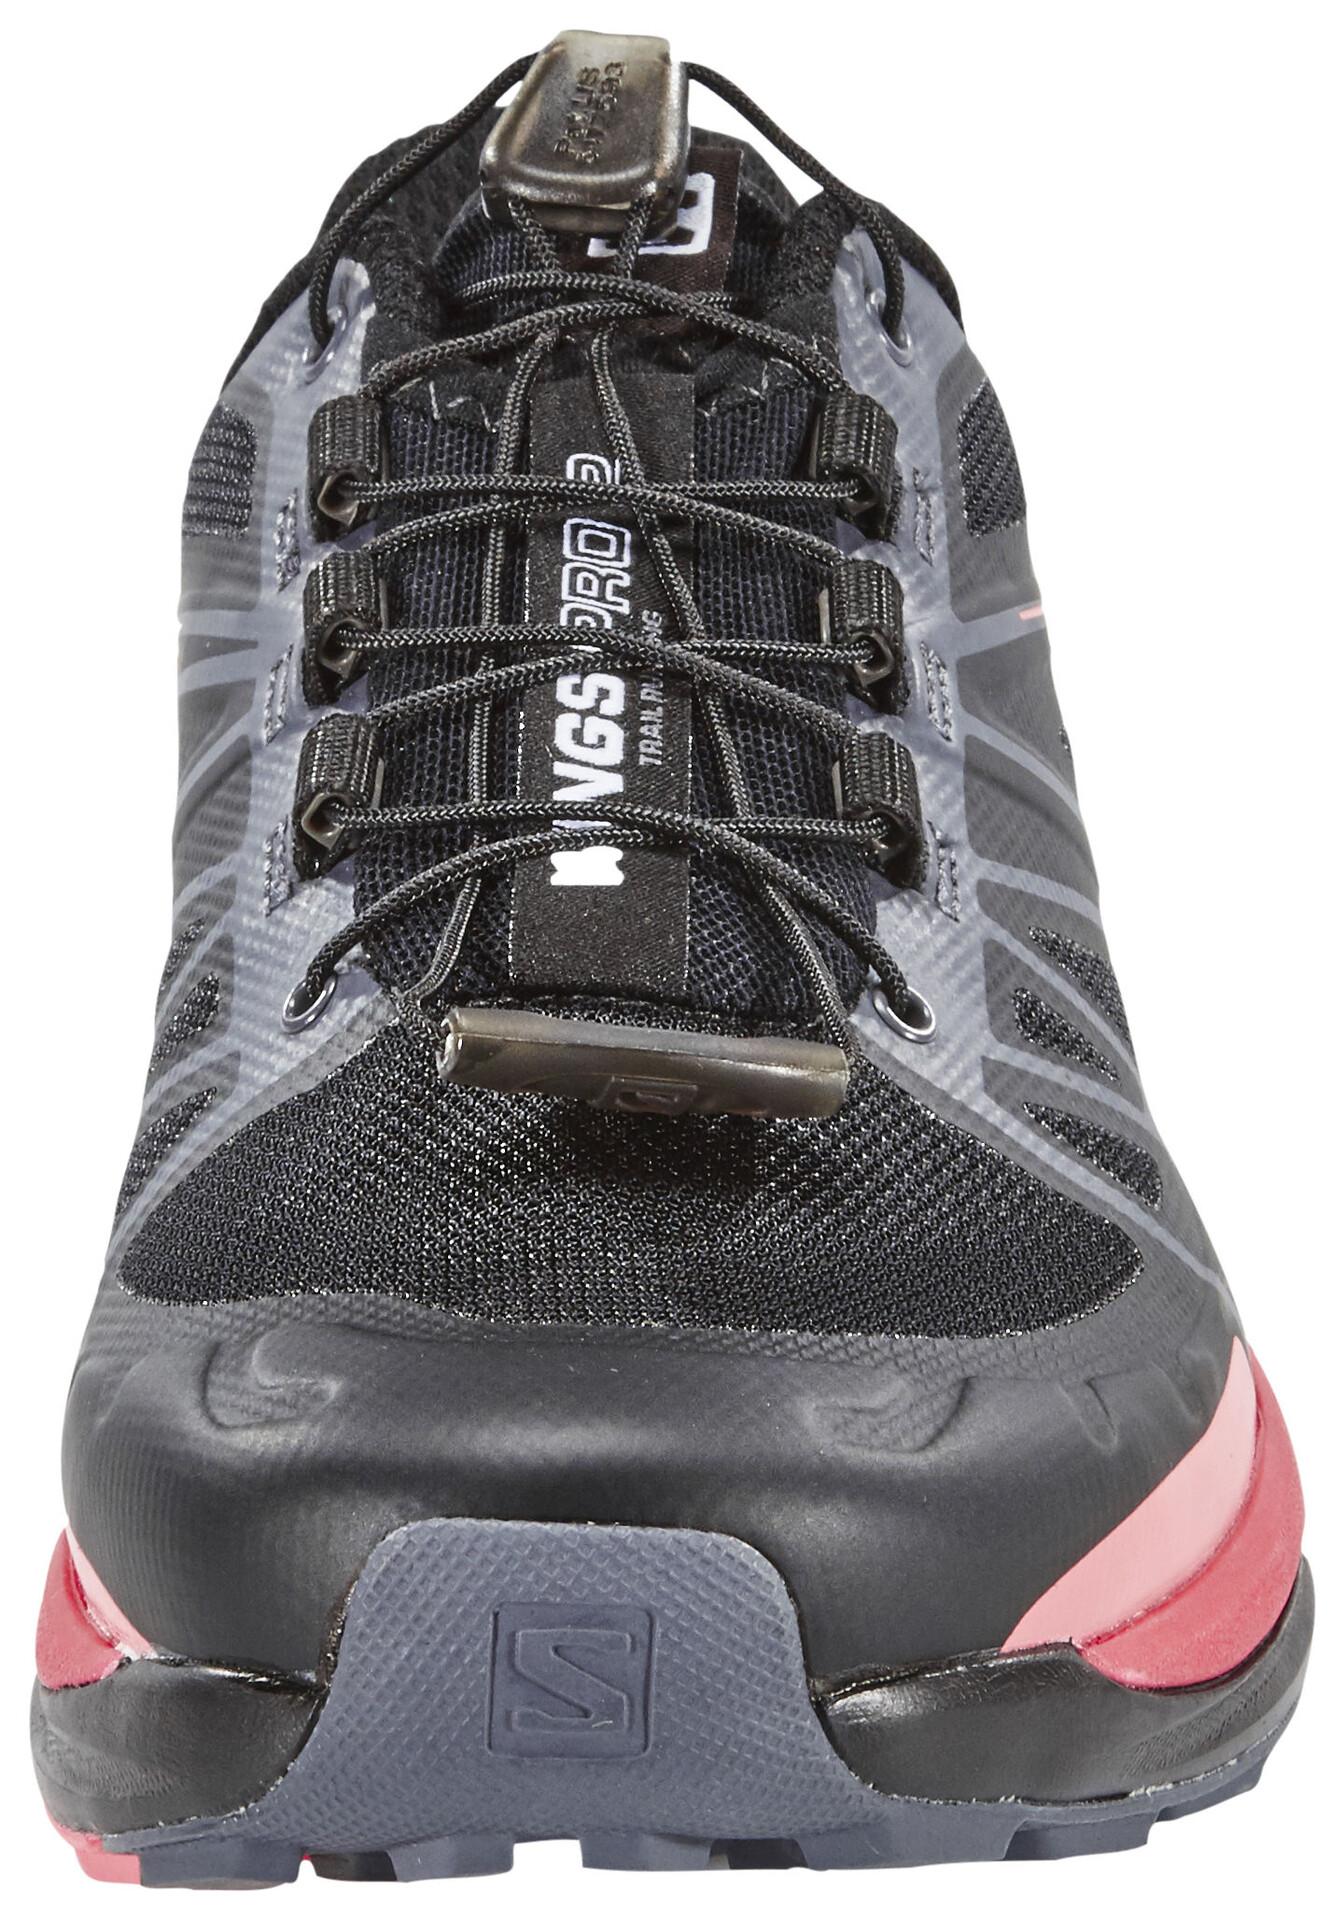 Off Trail Corriendo F8026 Mujeres Ebay Wings Salomon Zapatos Xt 81394 3 Rxw8qPX8